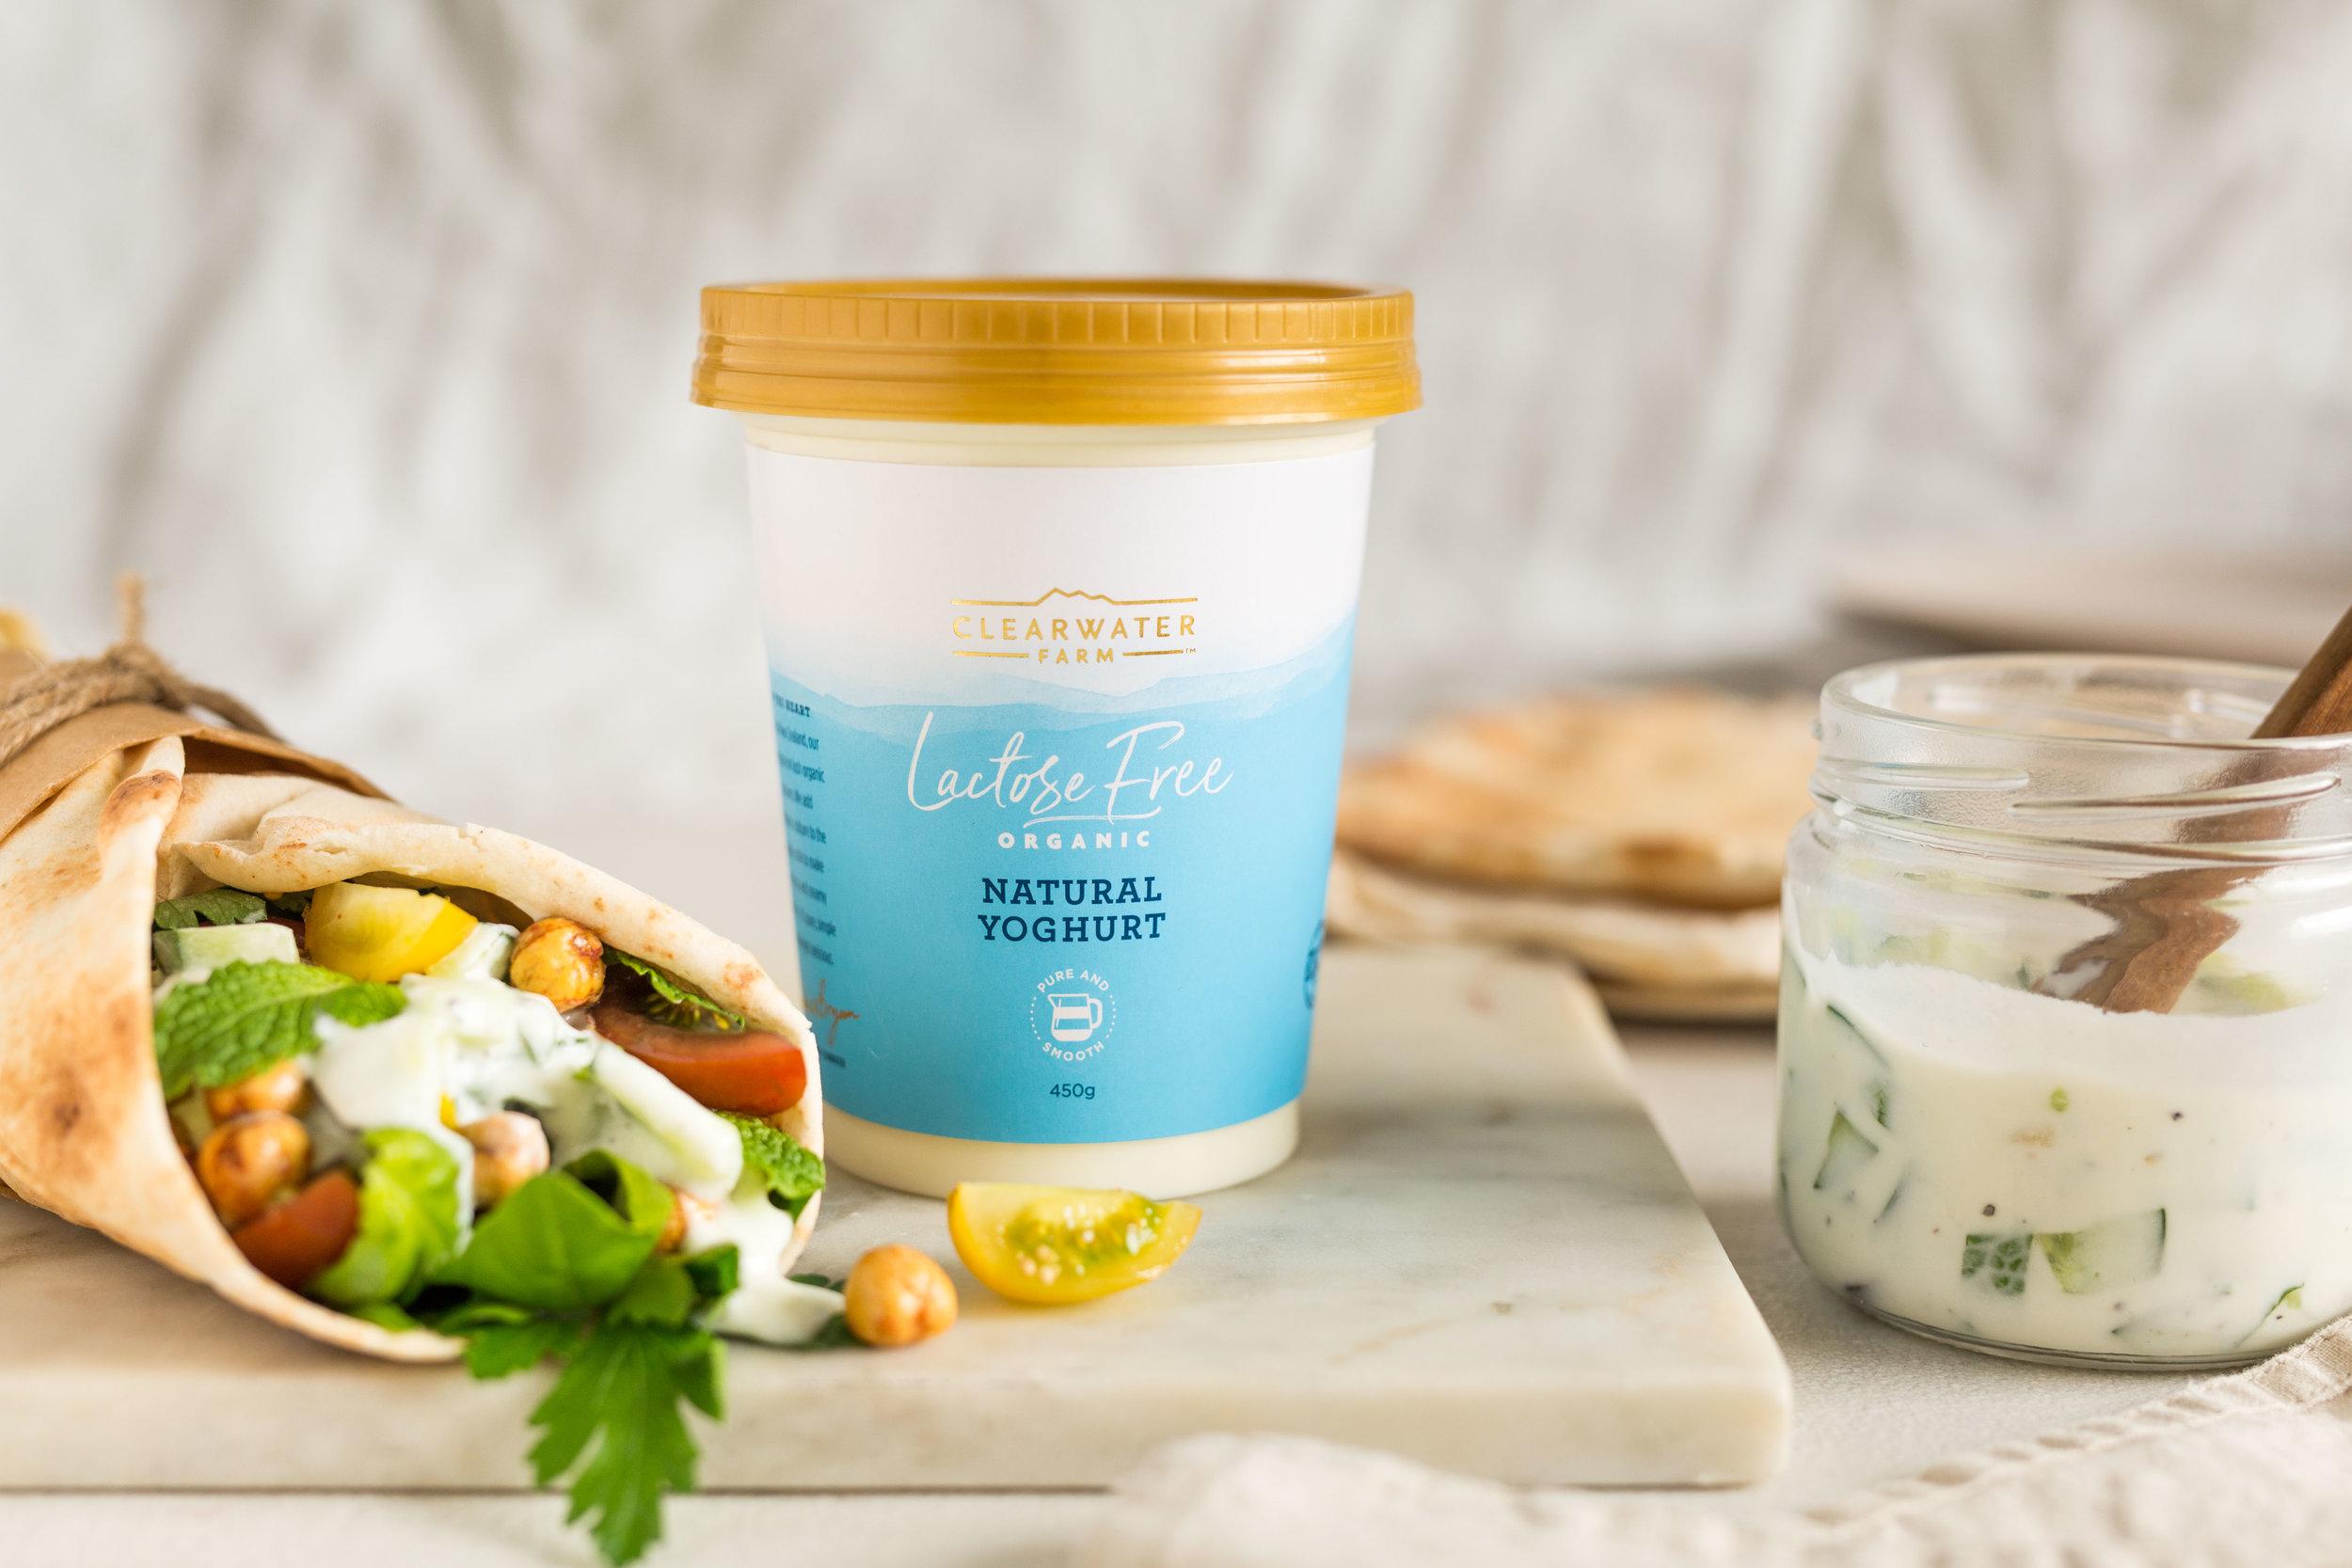 Clearwaters-Organic-Lactose-Free-Natural-Yoghurt-Cucumber-Dip.jpg